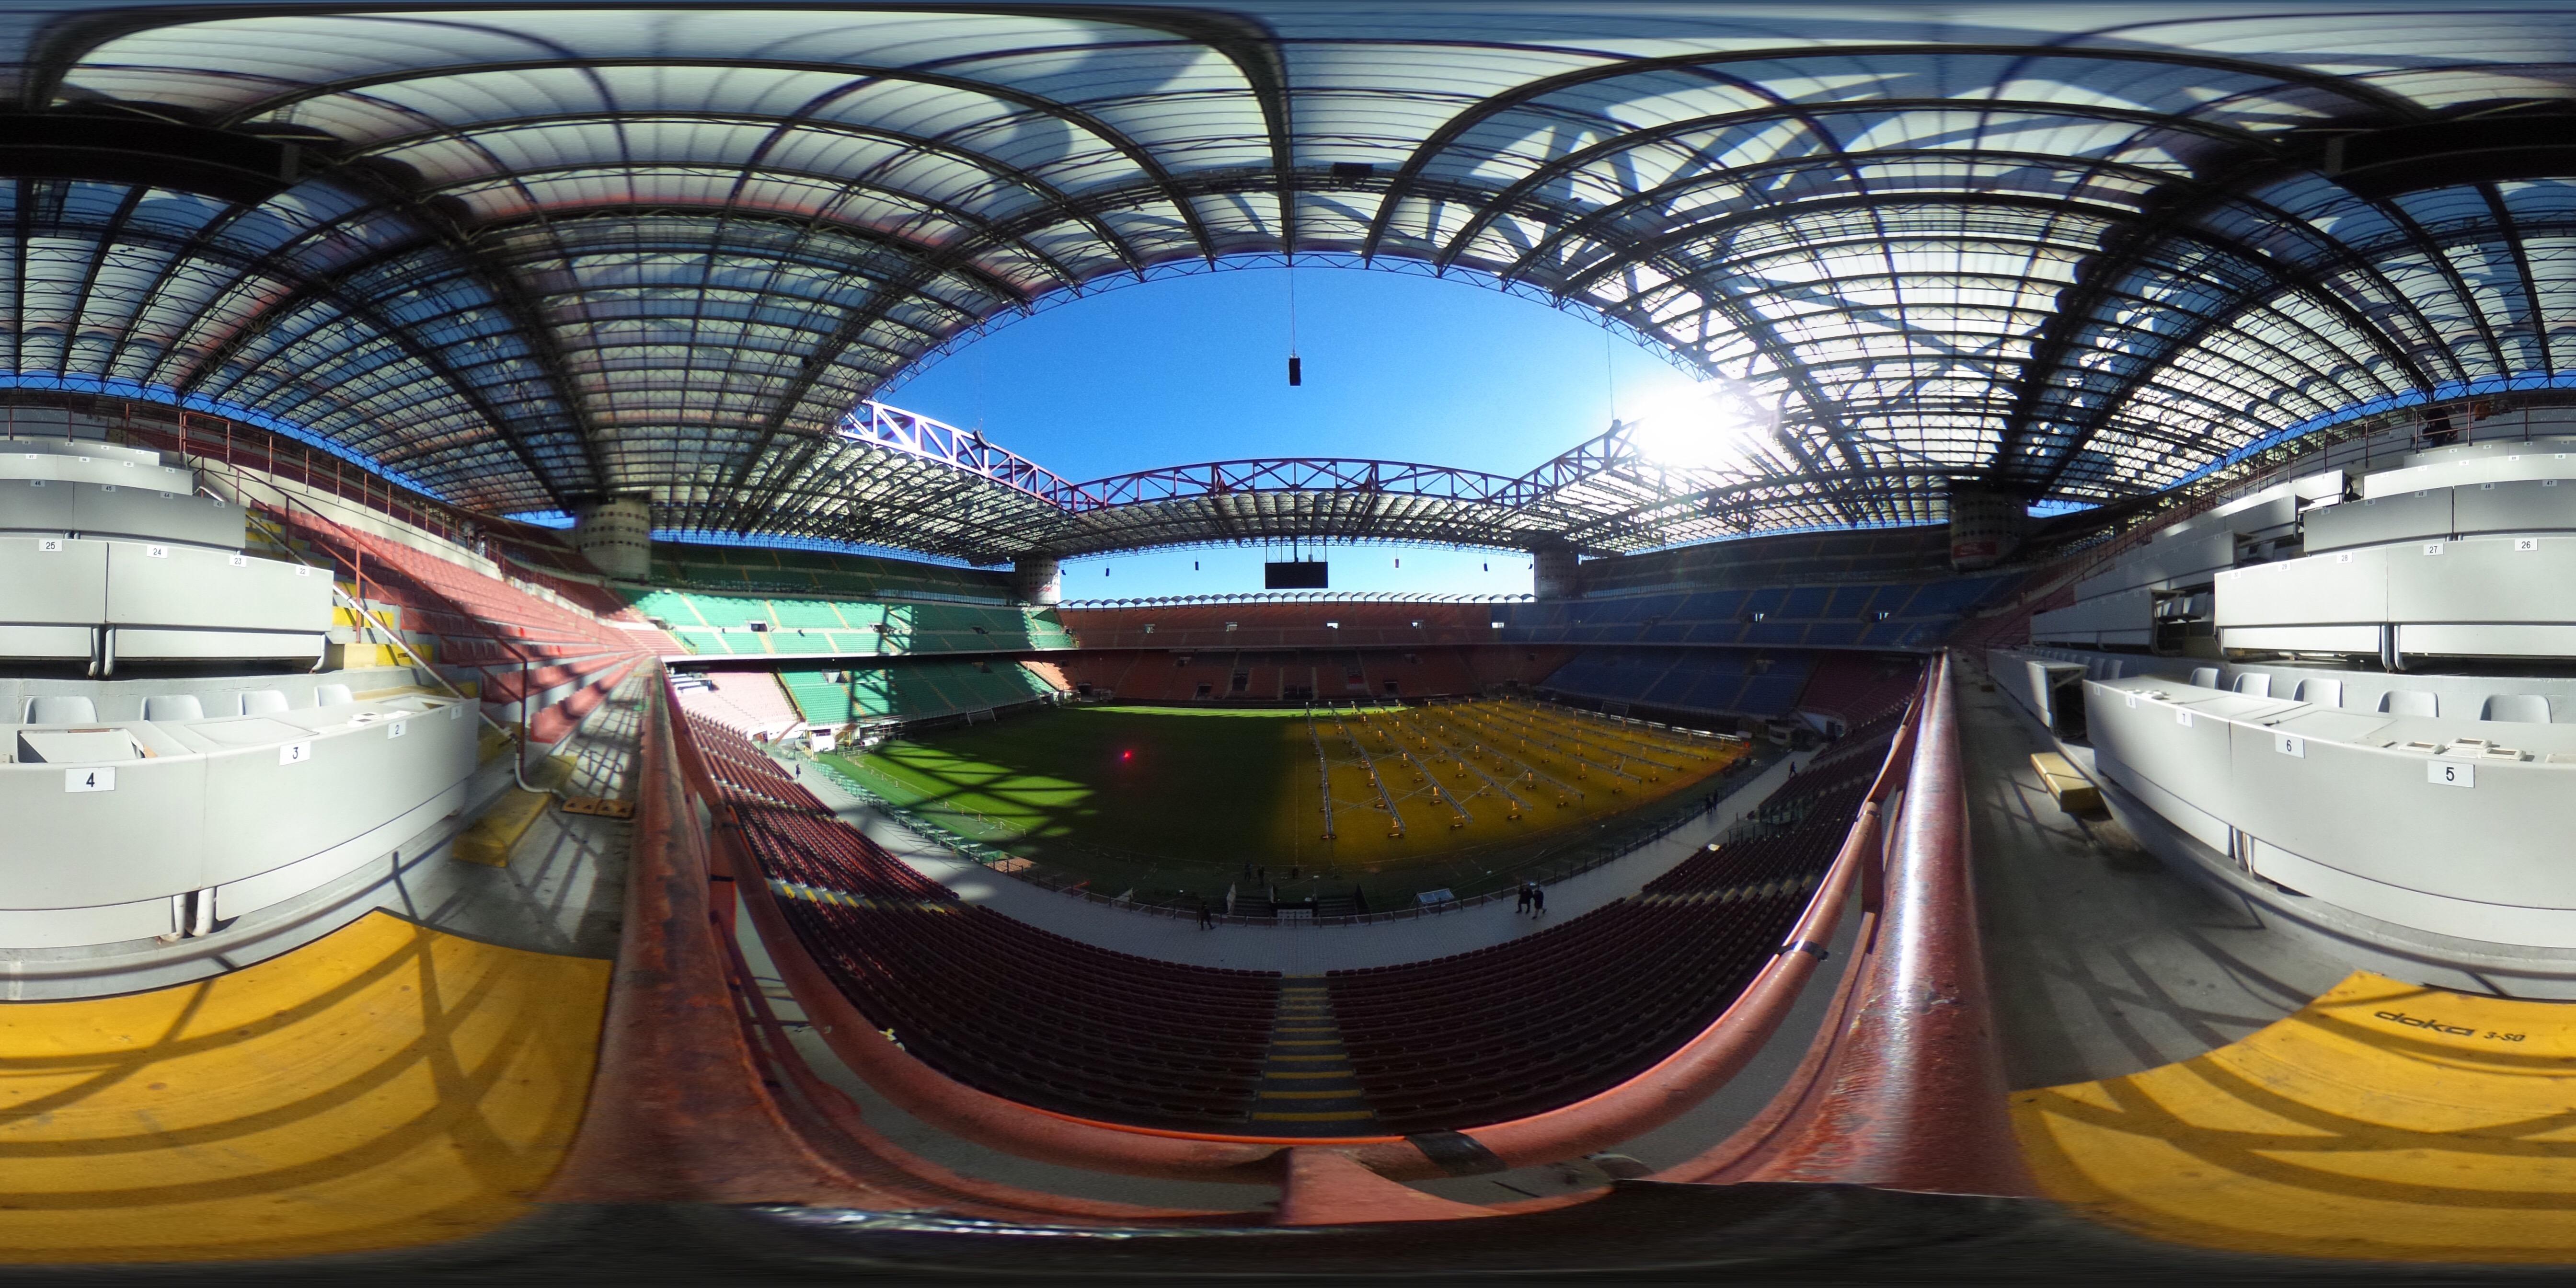 General Views of Stadio Giuseppe Meazza - UEFA Champions League Final Venue 2016